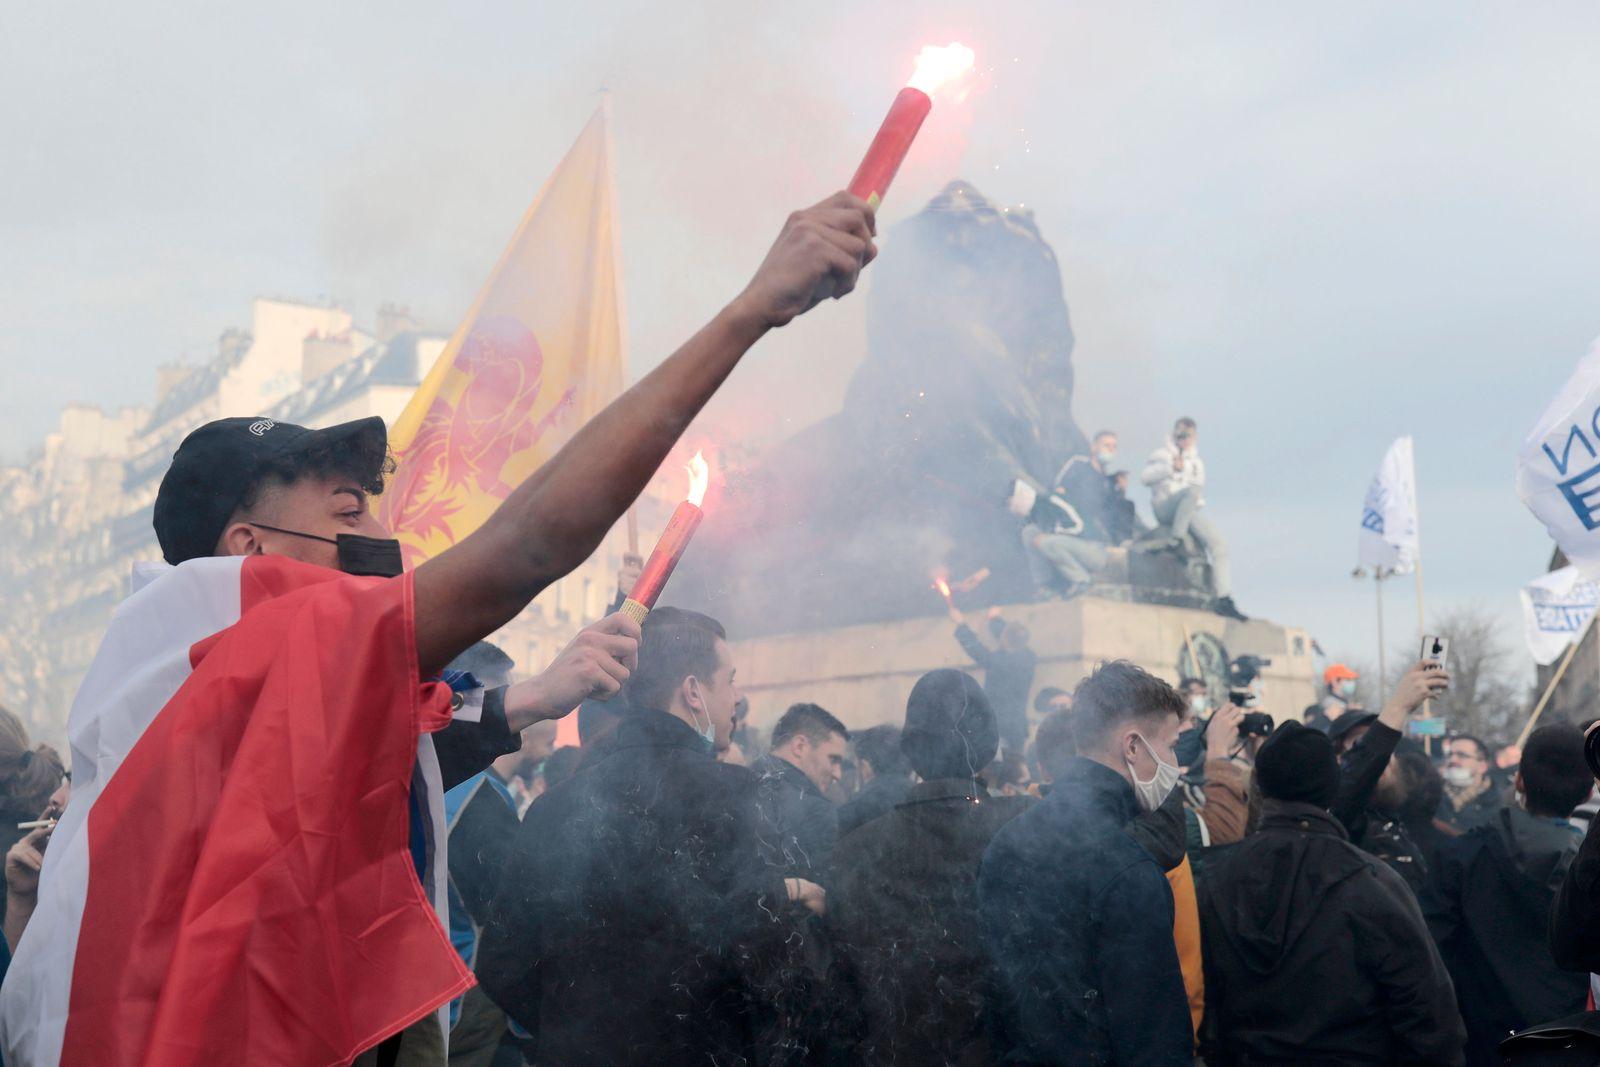 Protest der «Génération Identitaire» in Frankreich